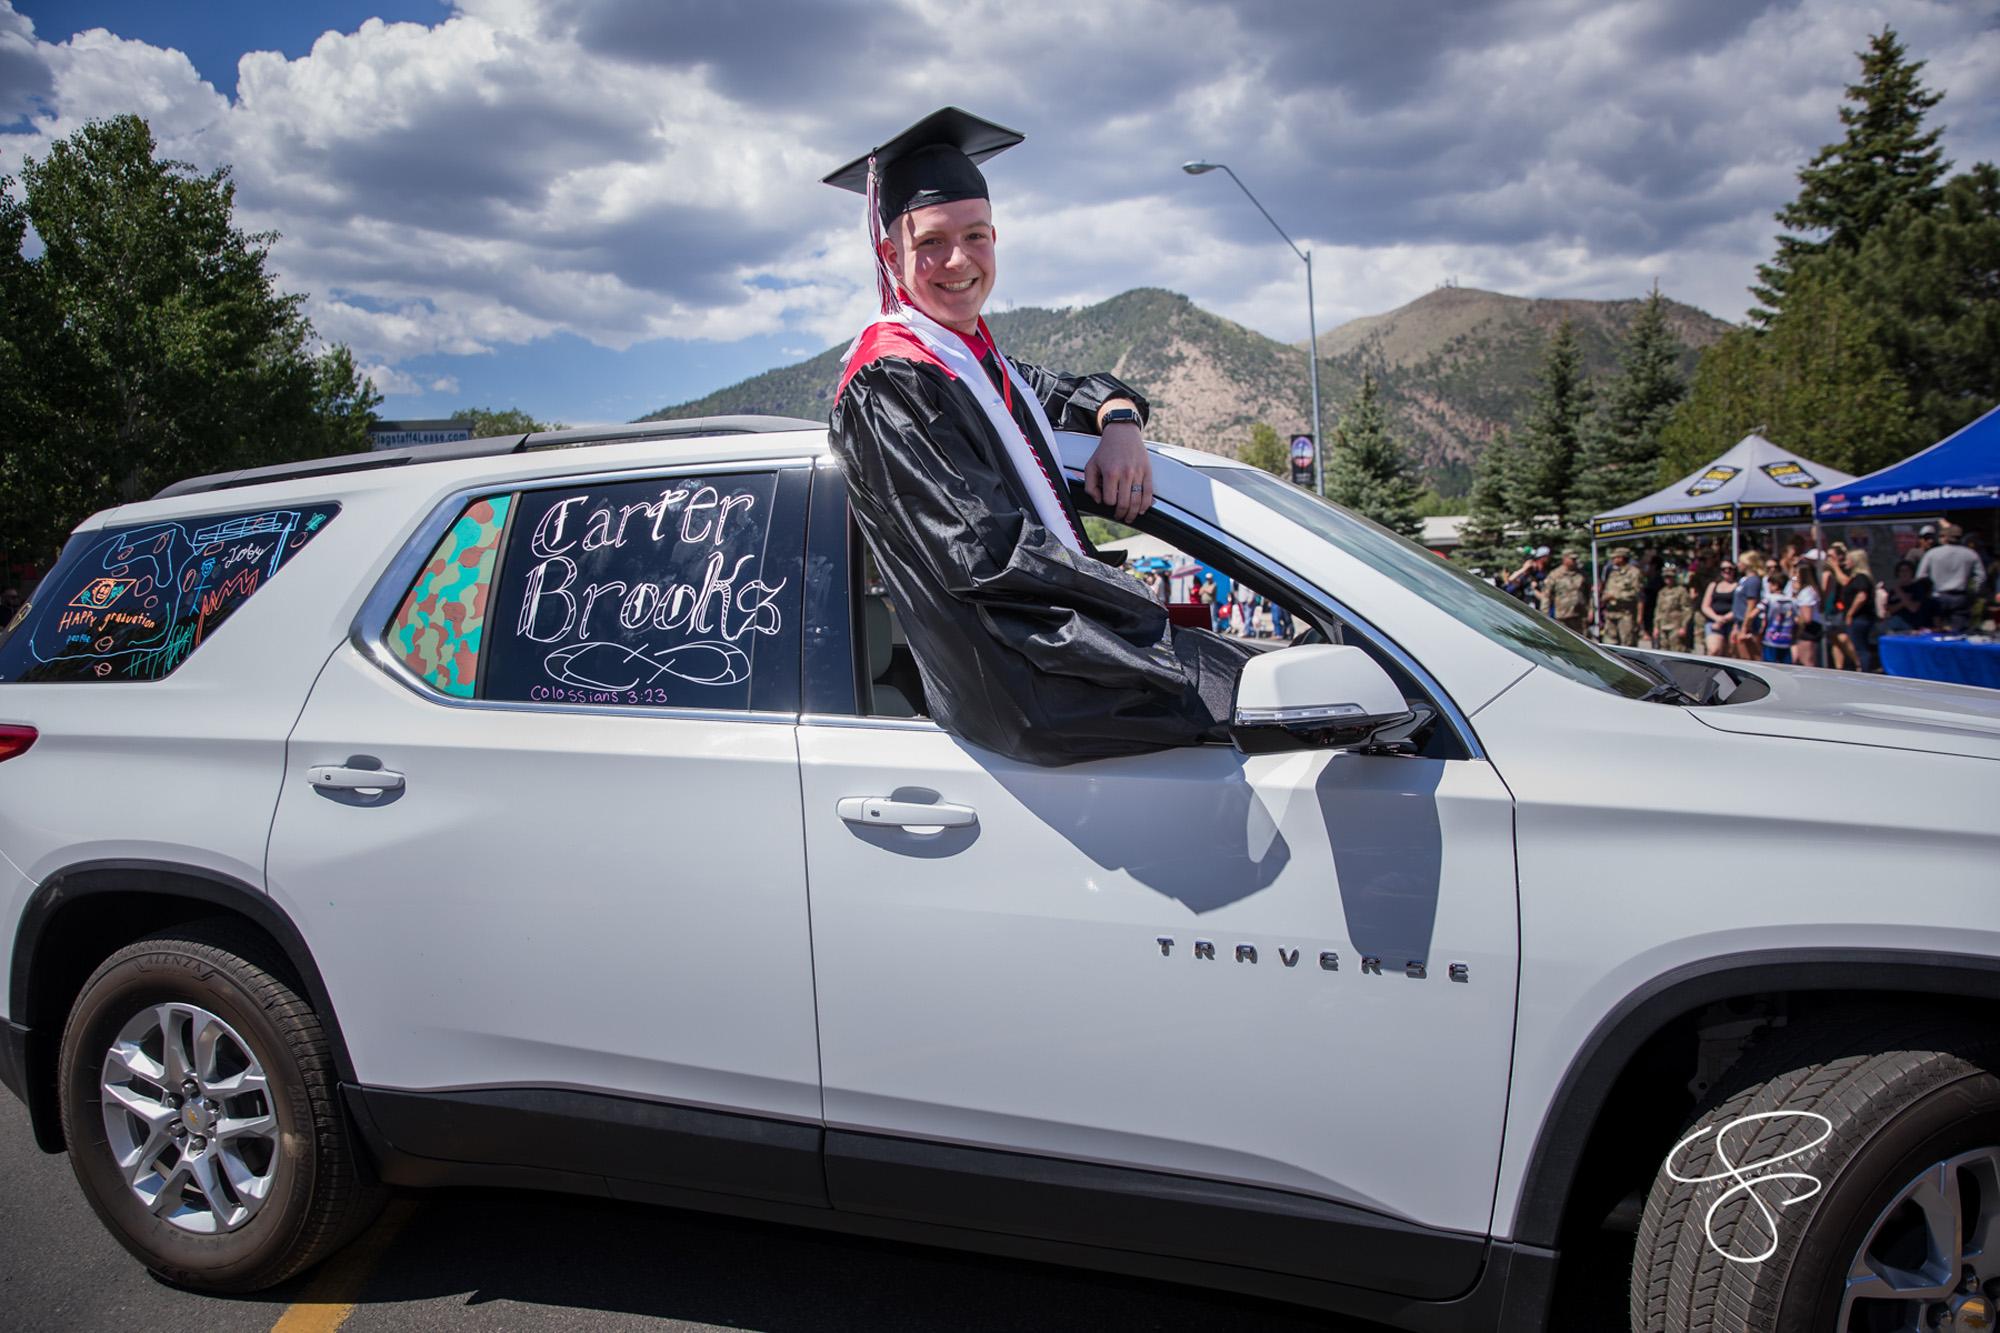 The Coconino High School Class of 2020 graduation ceremony proceeded down Fourth Street in Flagstaff, Arizona on May 29, 2020. CHS 2020 graduation photos by Sean Openshaw, www.SeanOpenshaw.com